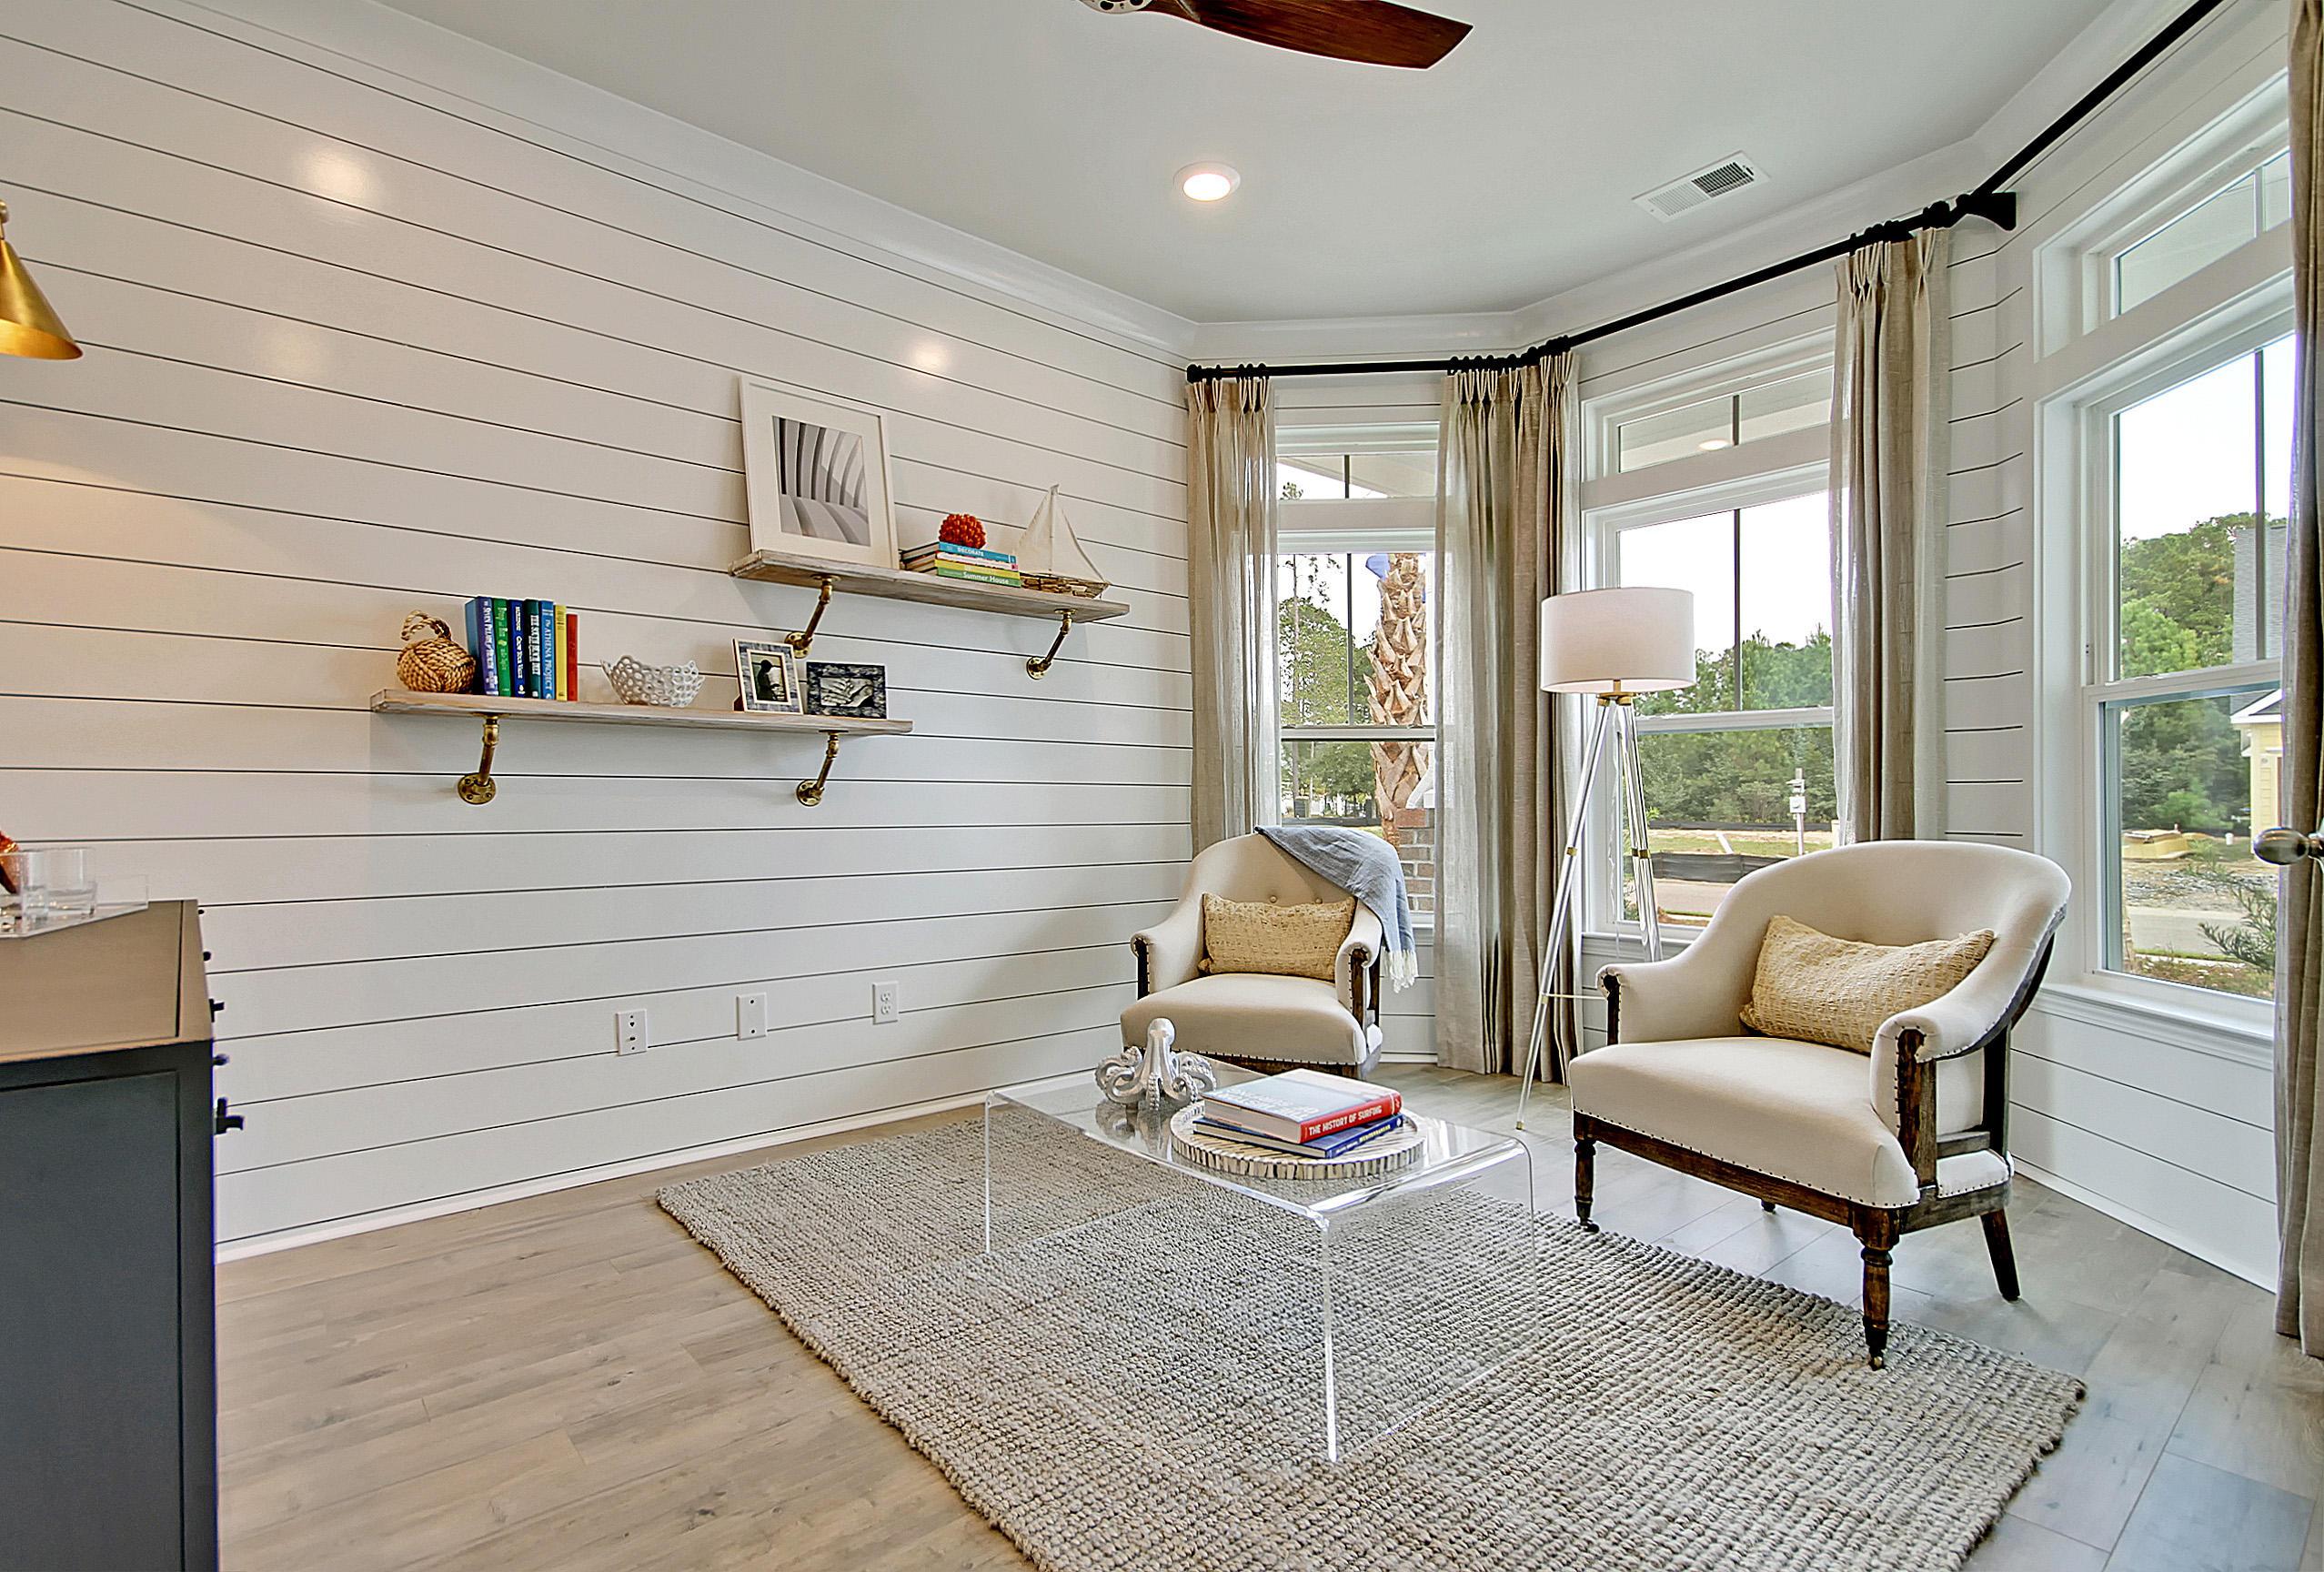 Park West Homes For Sale - 3066 Rice Field, Mount Pleasant, SC - 29